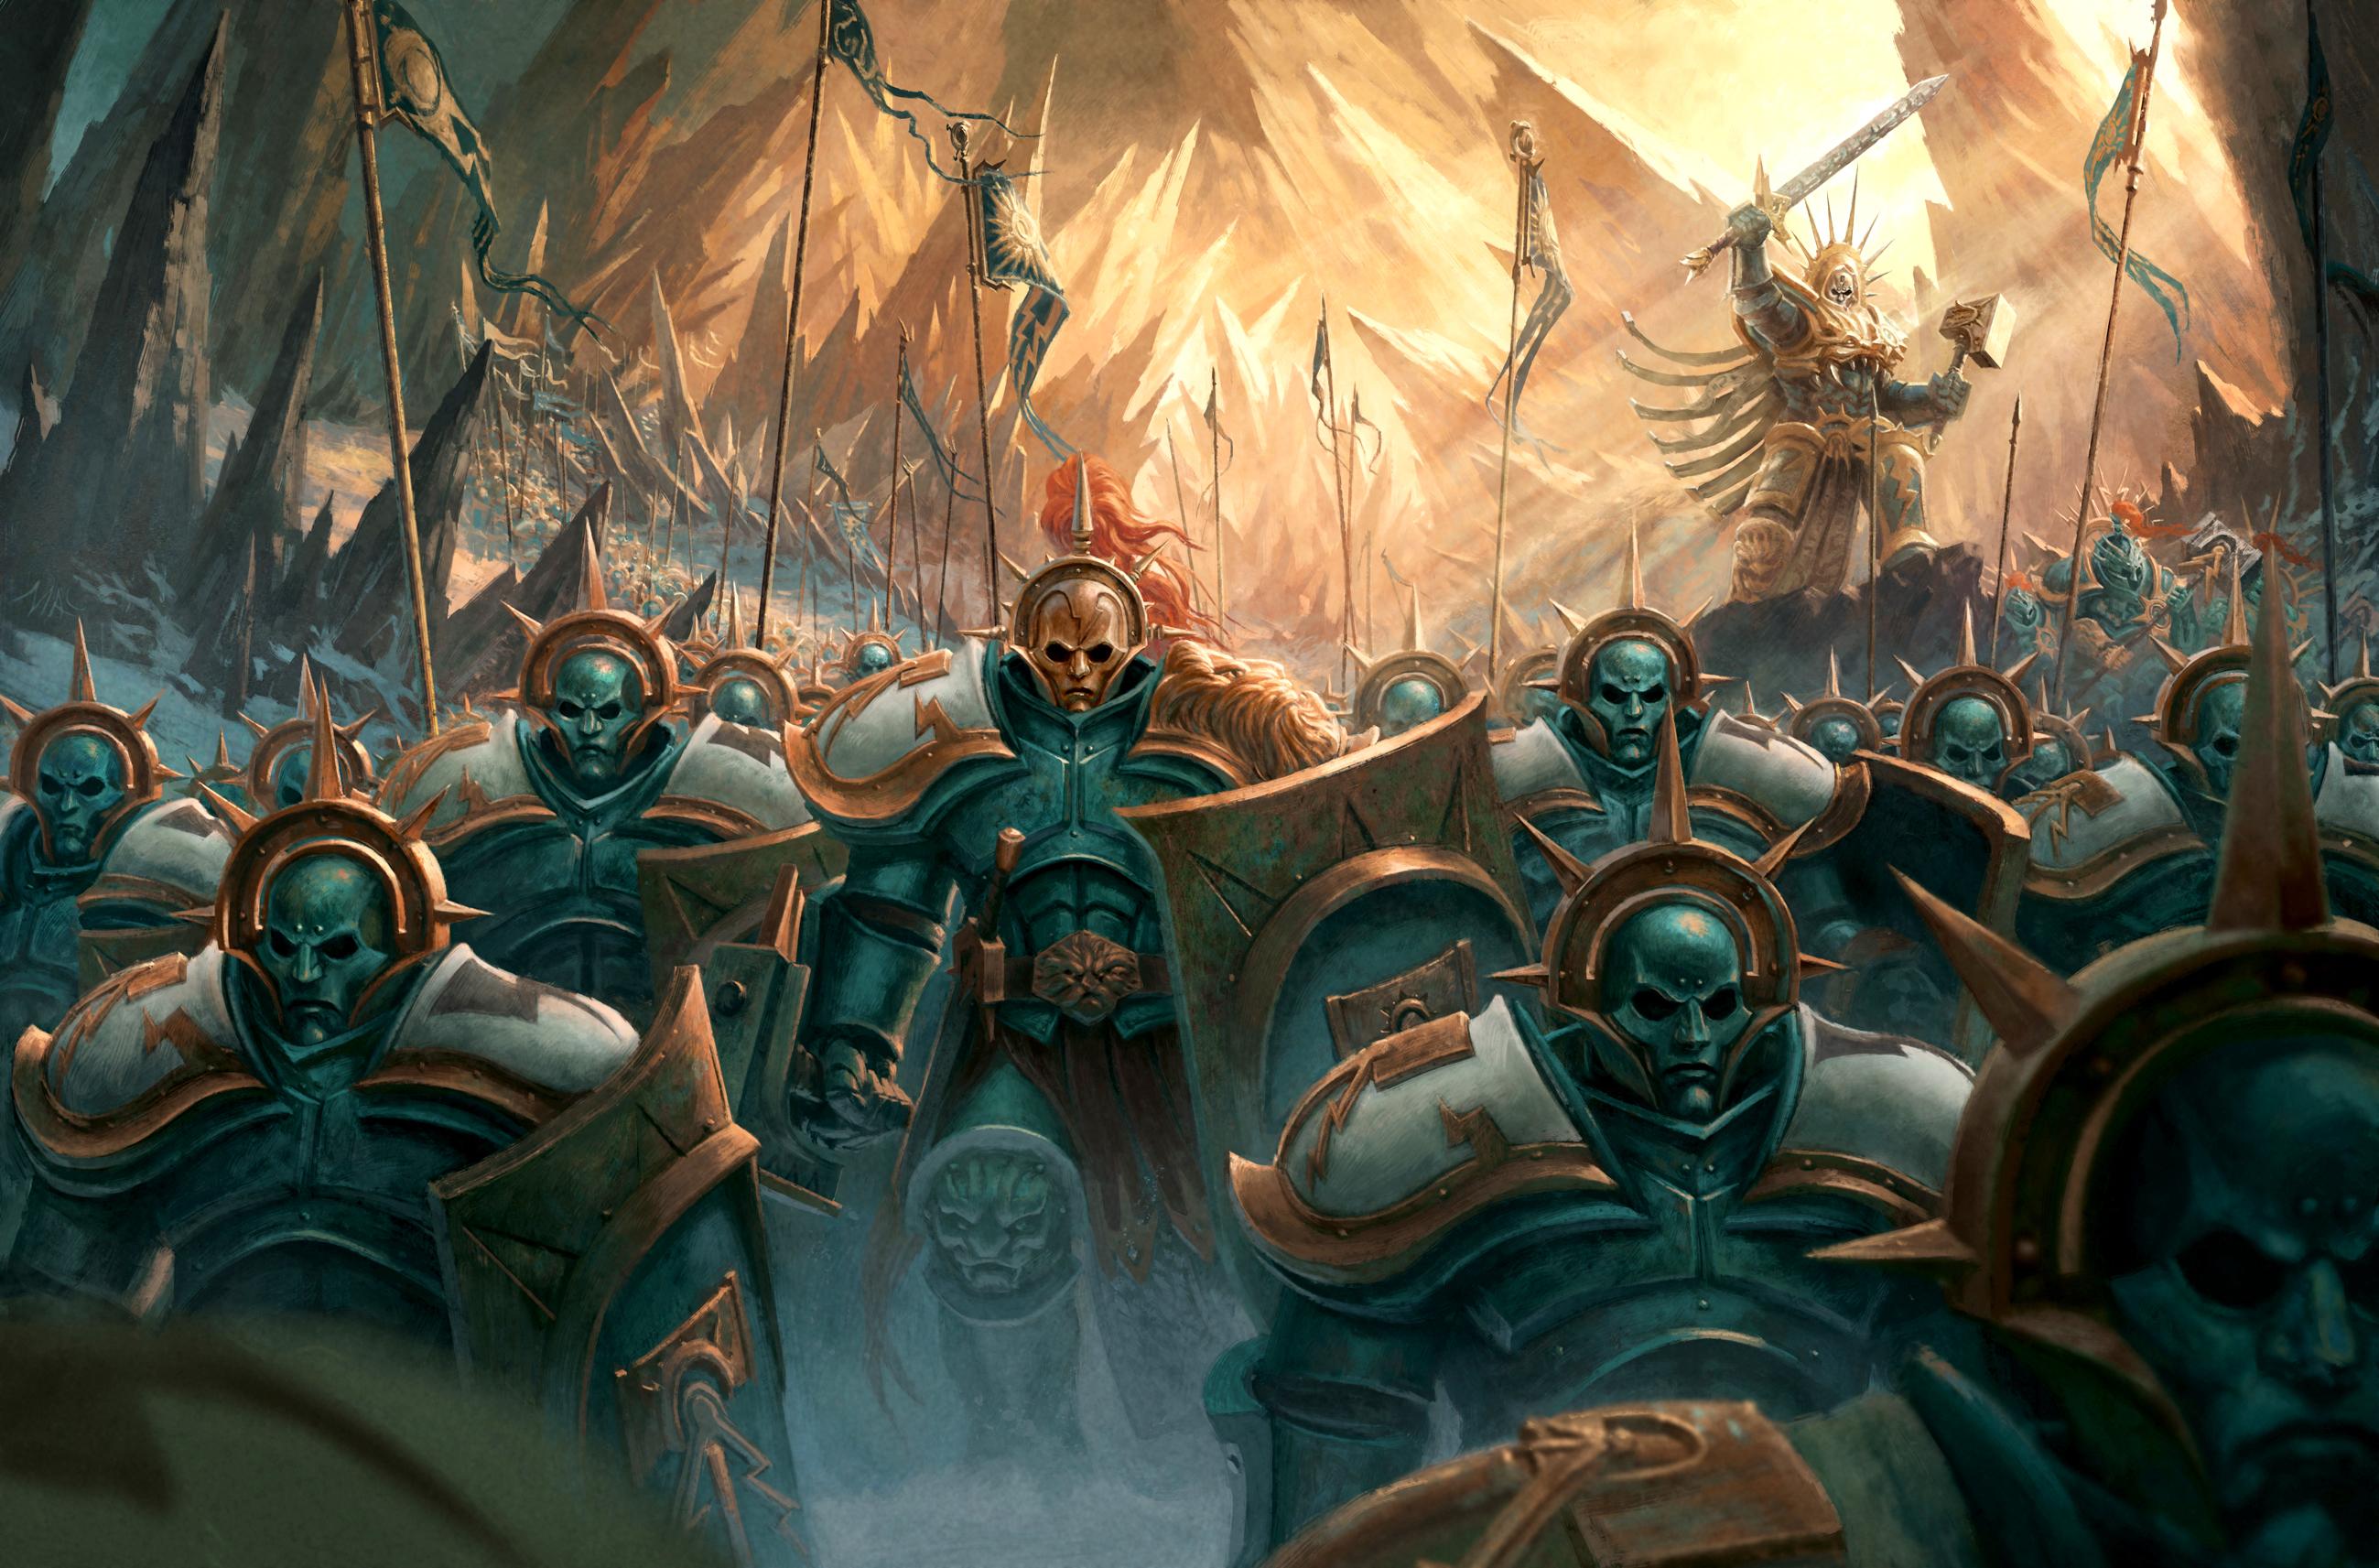 Warhammer Hd Wallpaper Background Image 2599x1713 Id 689525